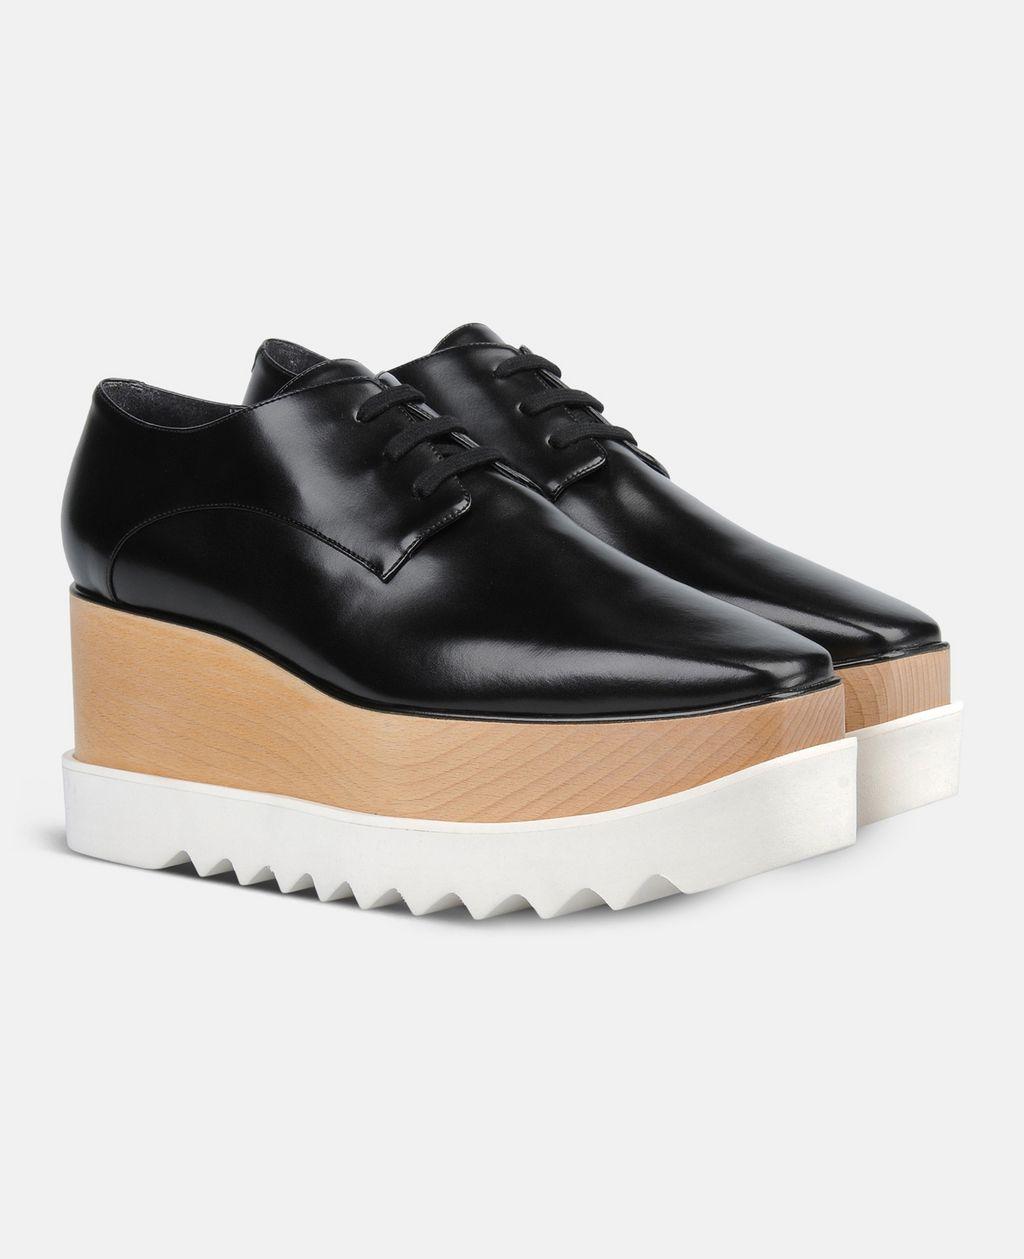 Black Elyse Shoes - STELLA MCCARTNEY